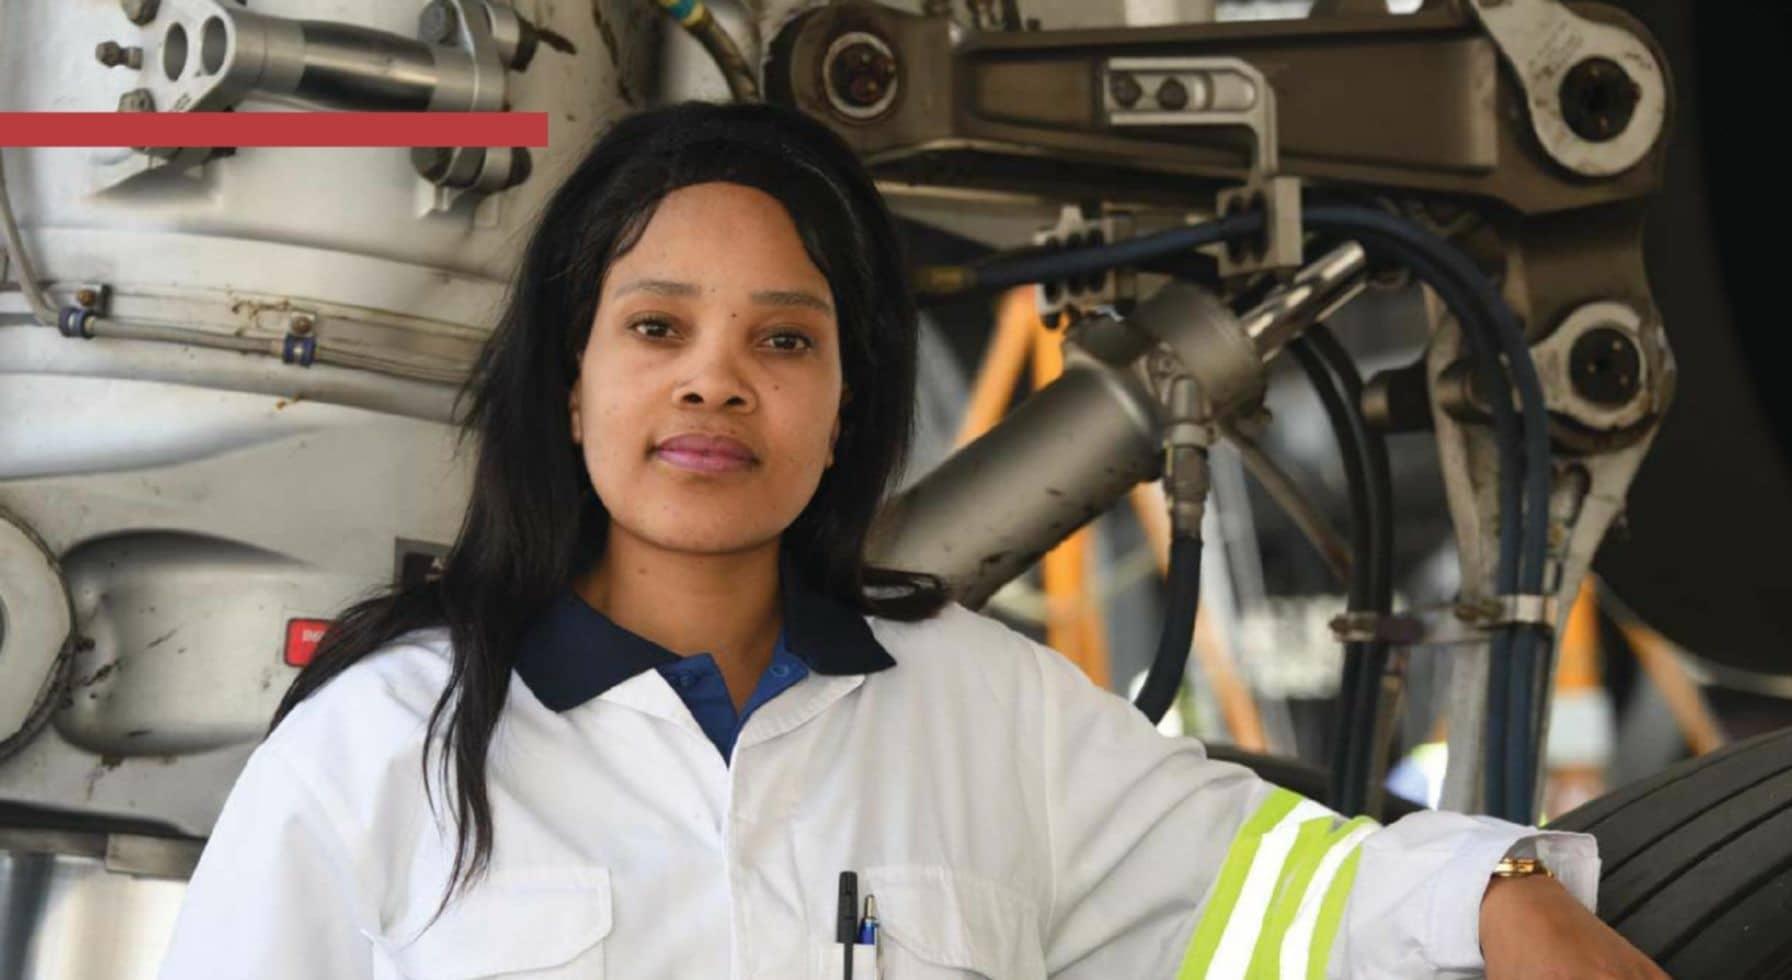 Lefentse Phokwane Reaching New Heights At SAA